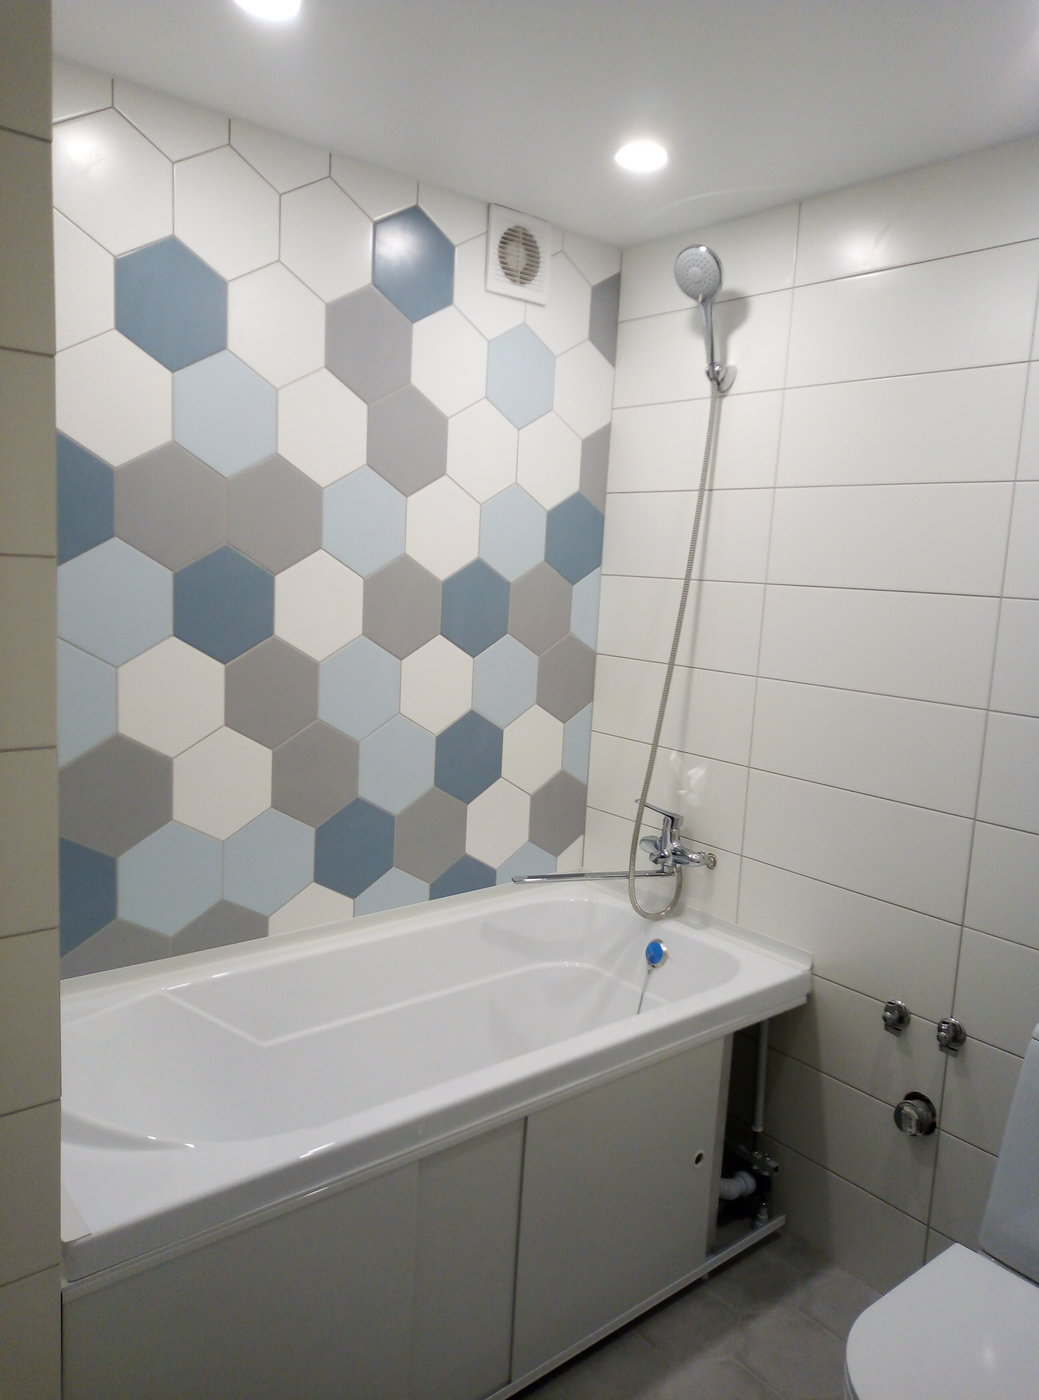 Ремонт туалета. Ремонт ванной под ключ, сантехника, электрика, установка